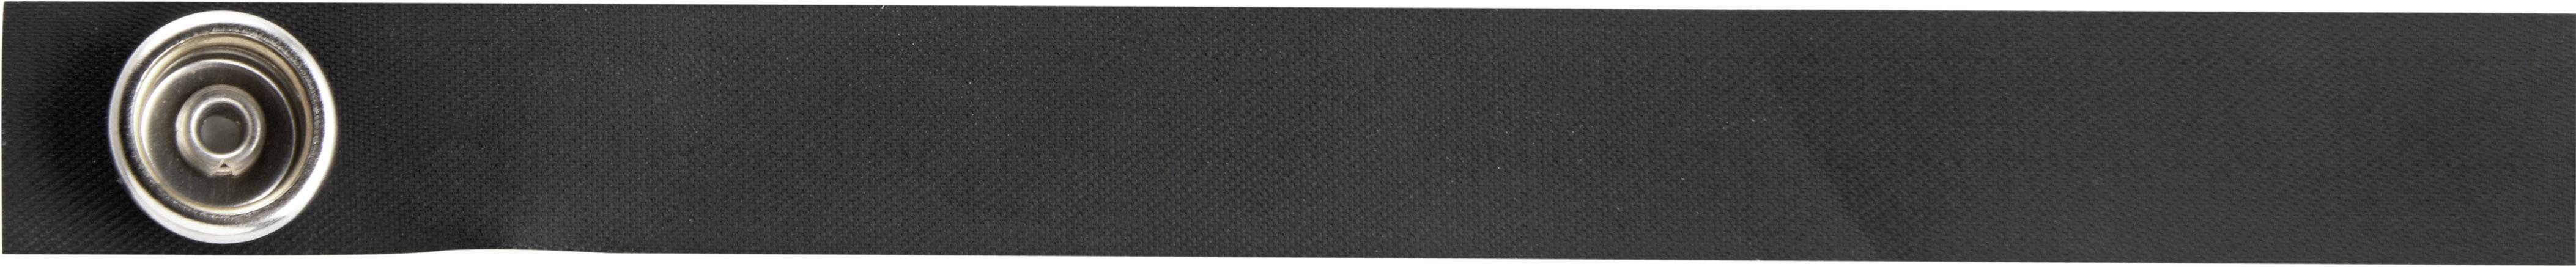 Wolfgang Warmbier 2560.890.R.47, 1 ks, čierna